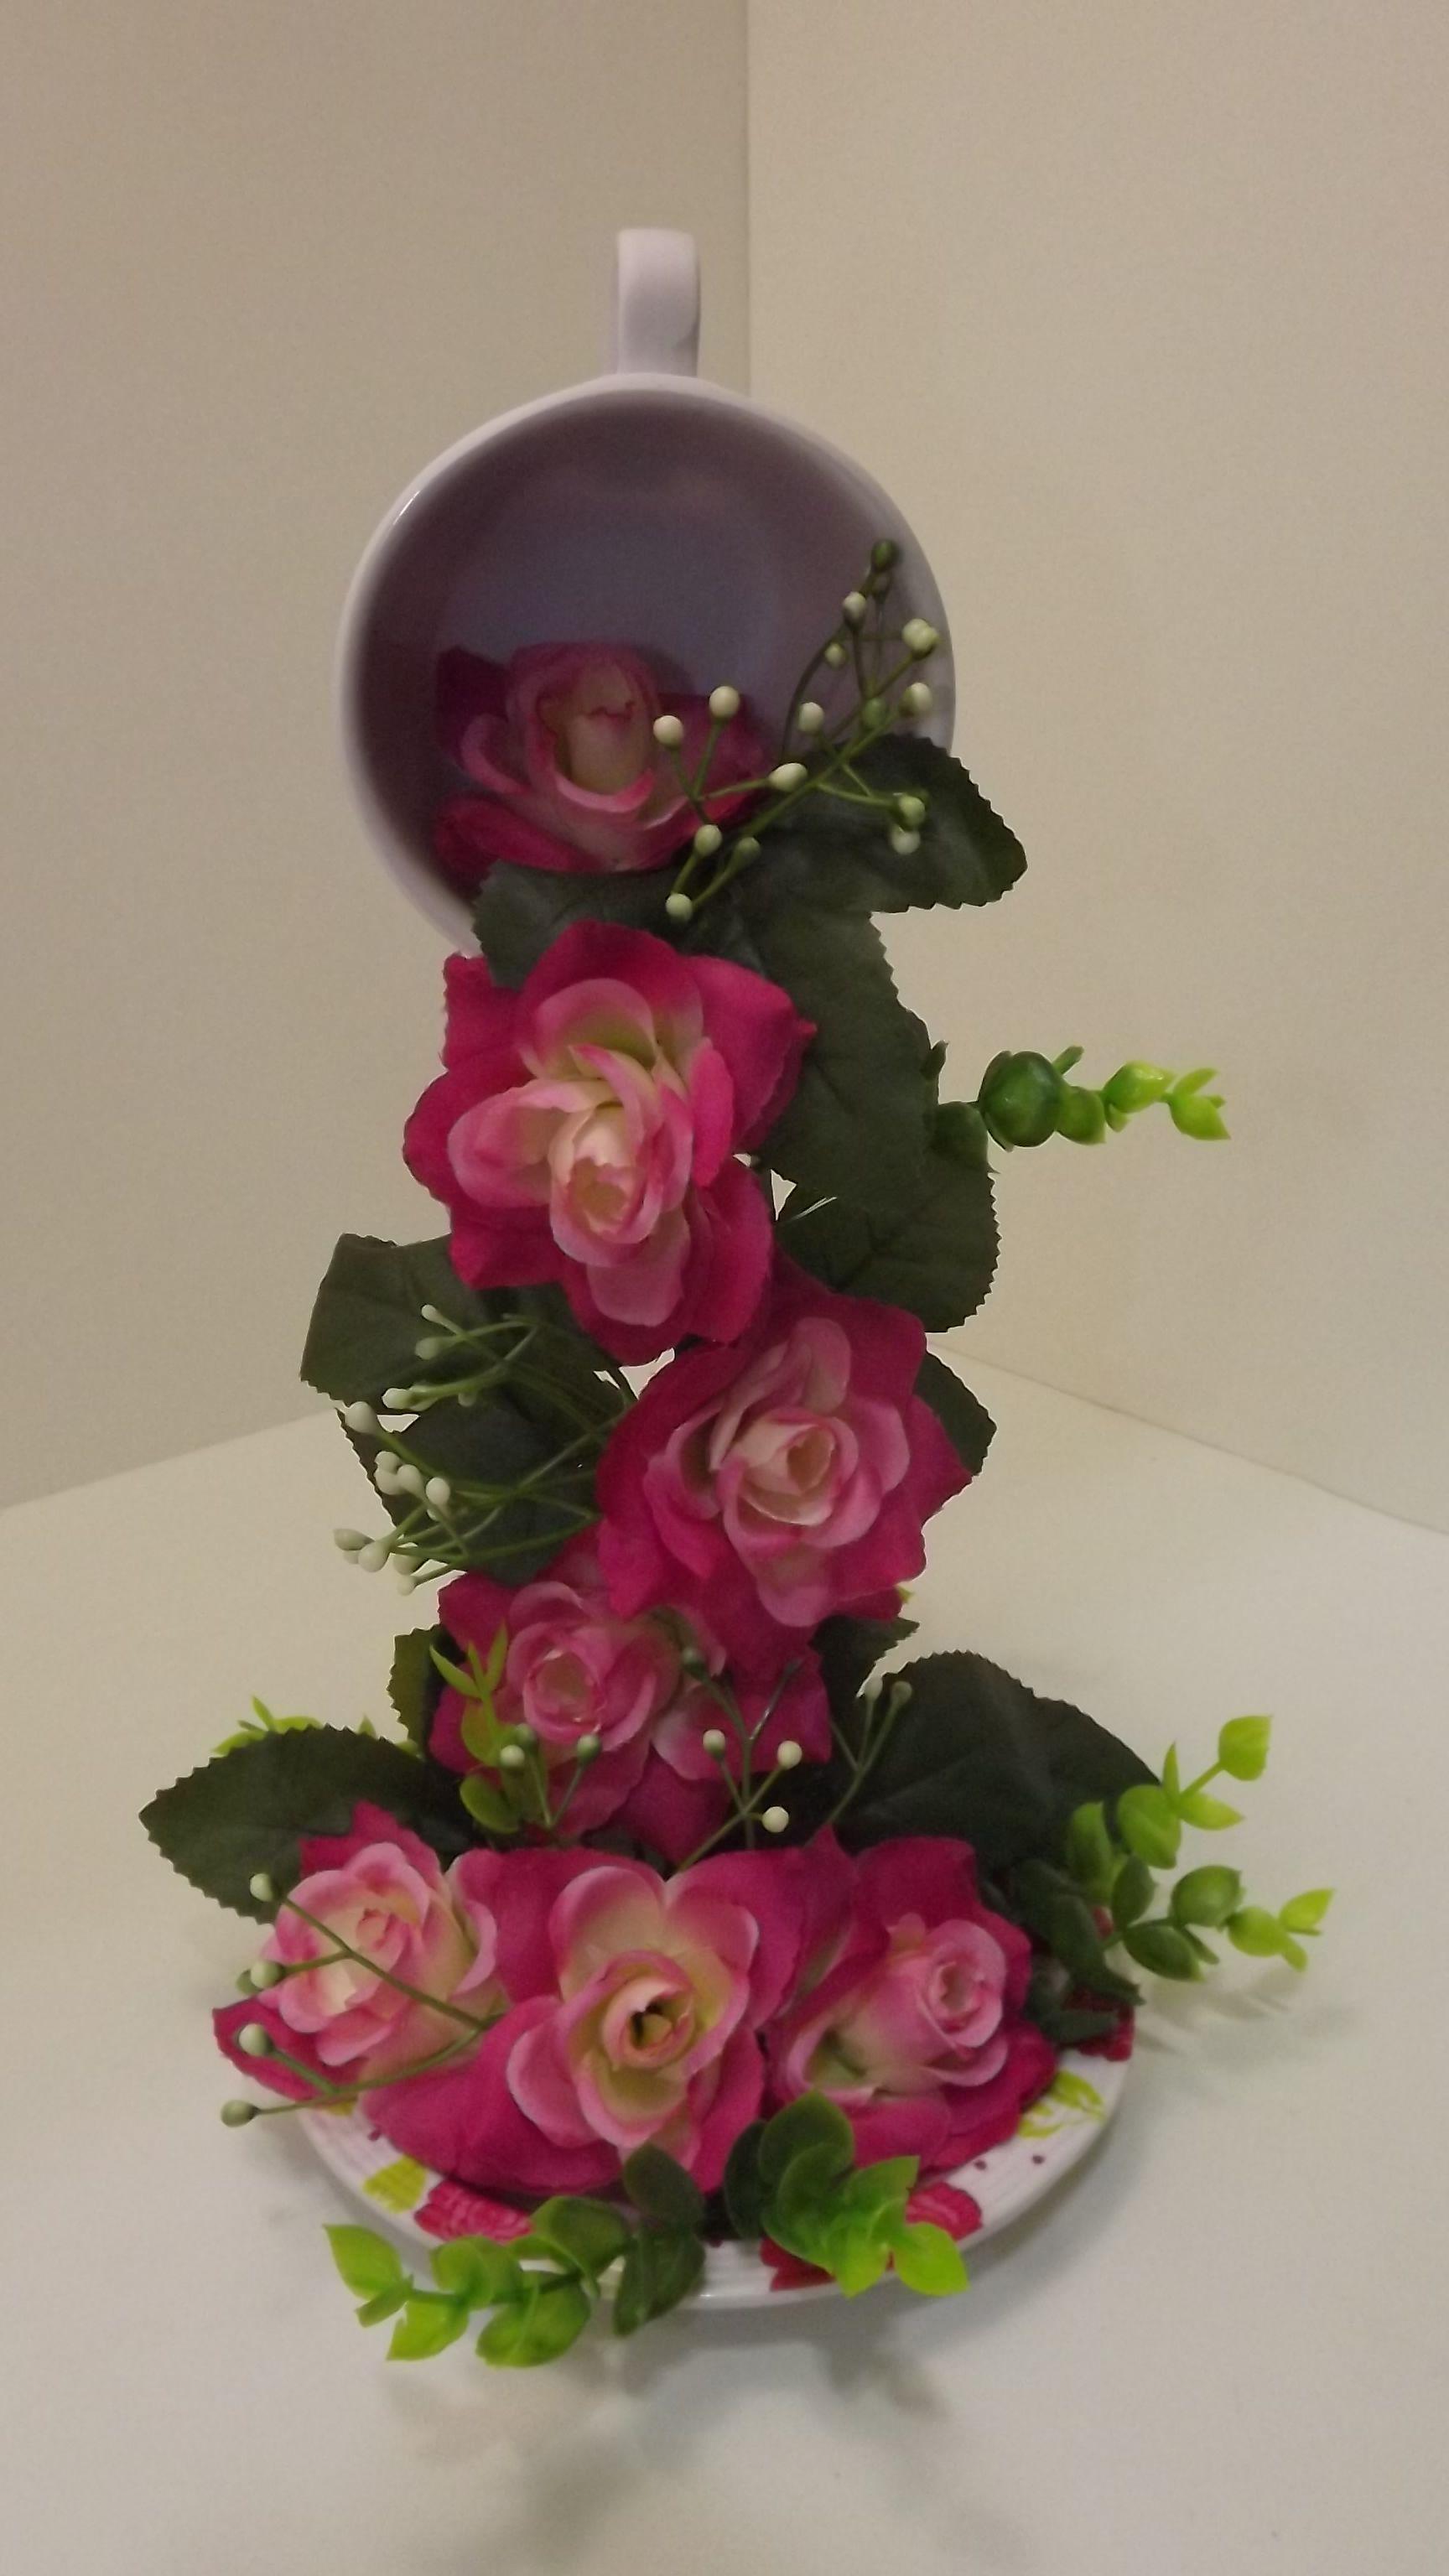 Arreglos de flores en tazas de cafe buscar con google for Decoracion con tazas de cafe